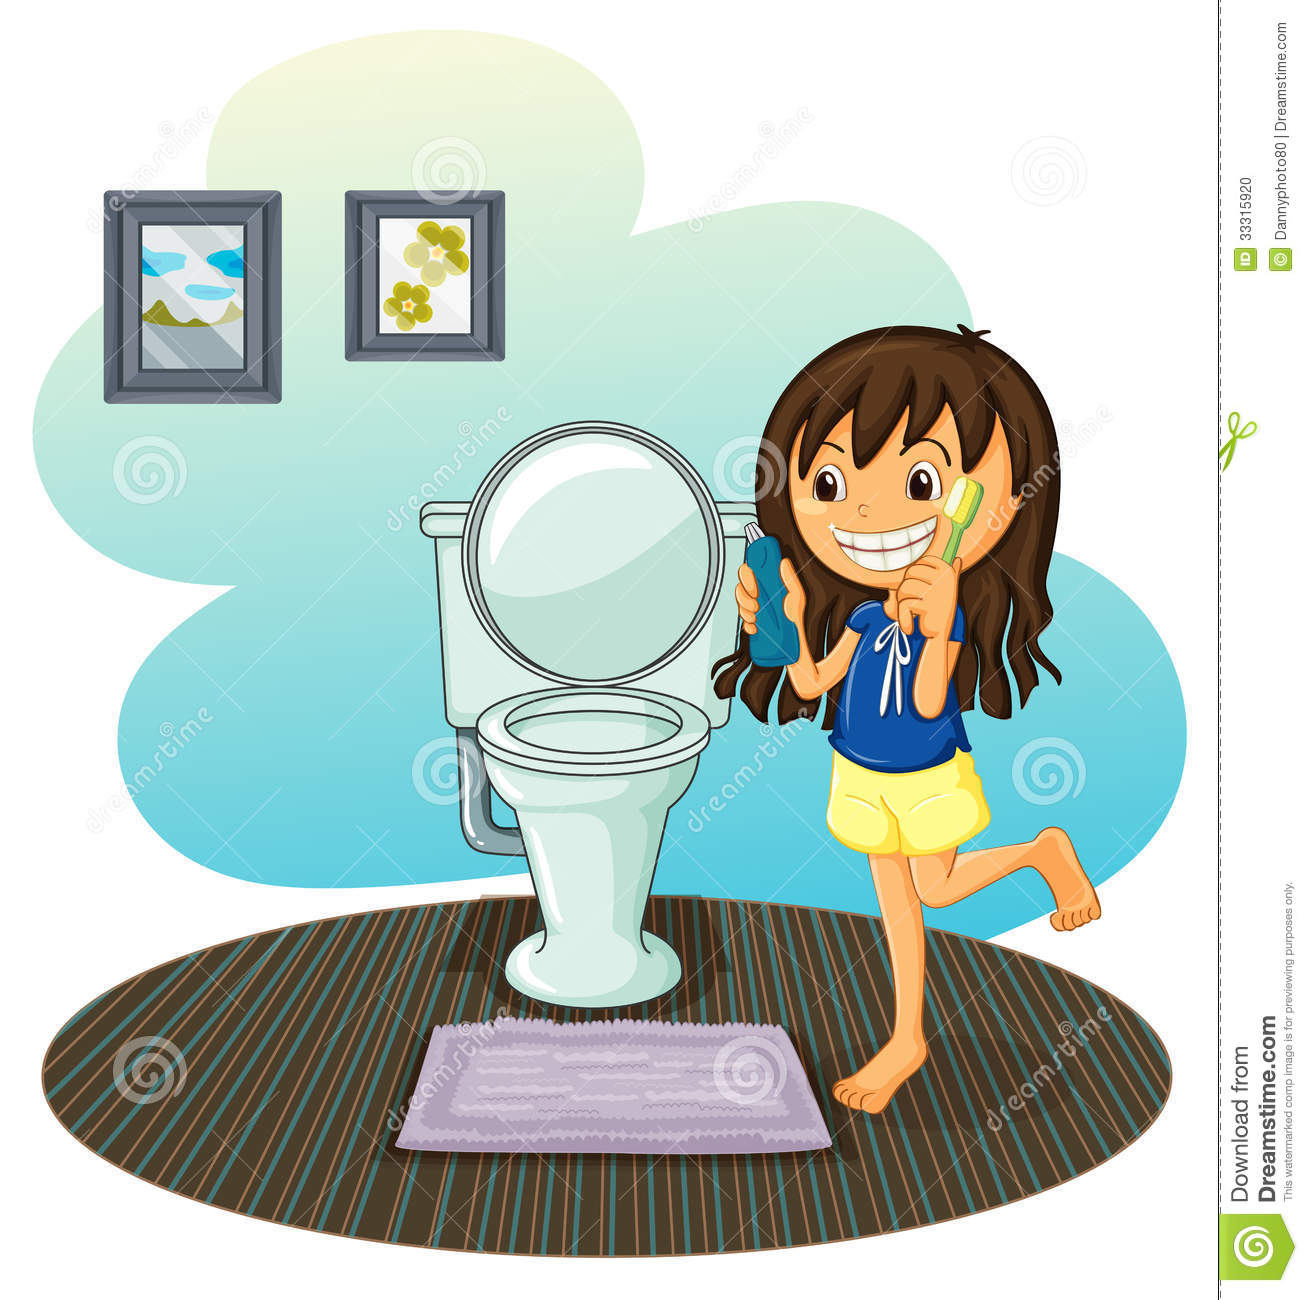 Bath free download best. Chore clipart bathroom